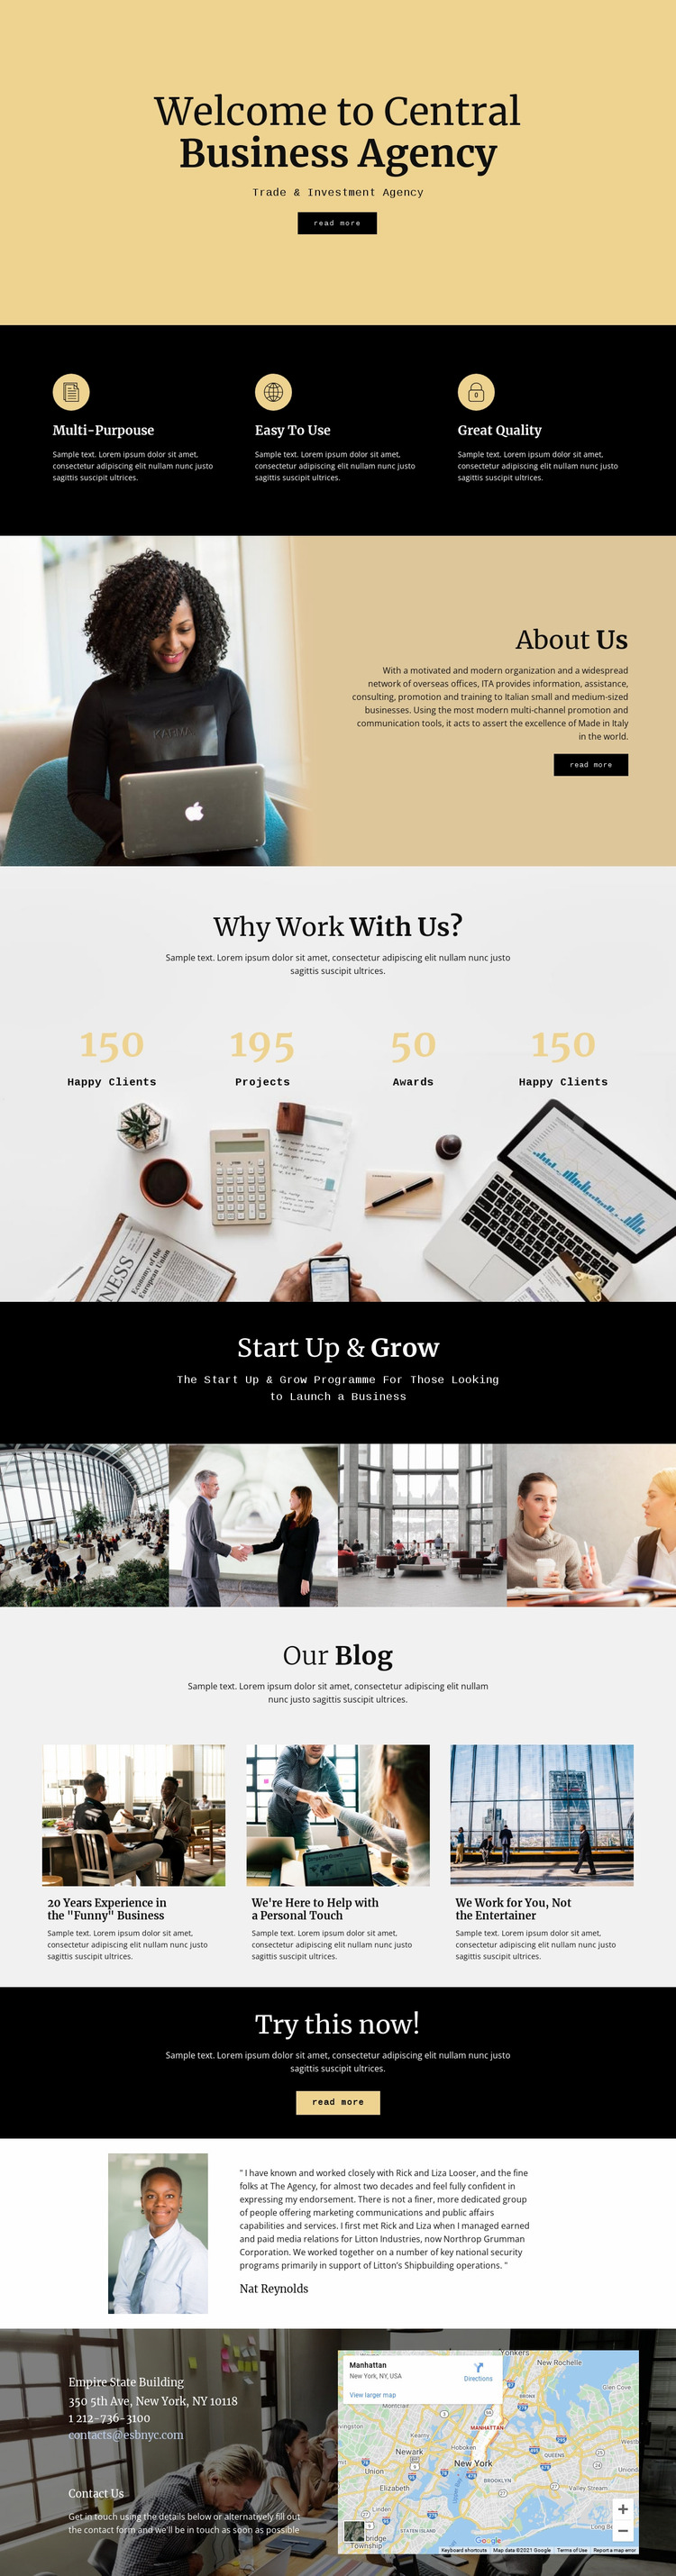 Central digital agency Website Mockup